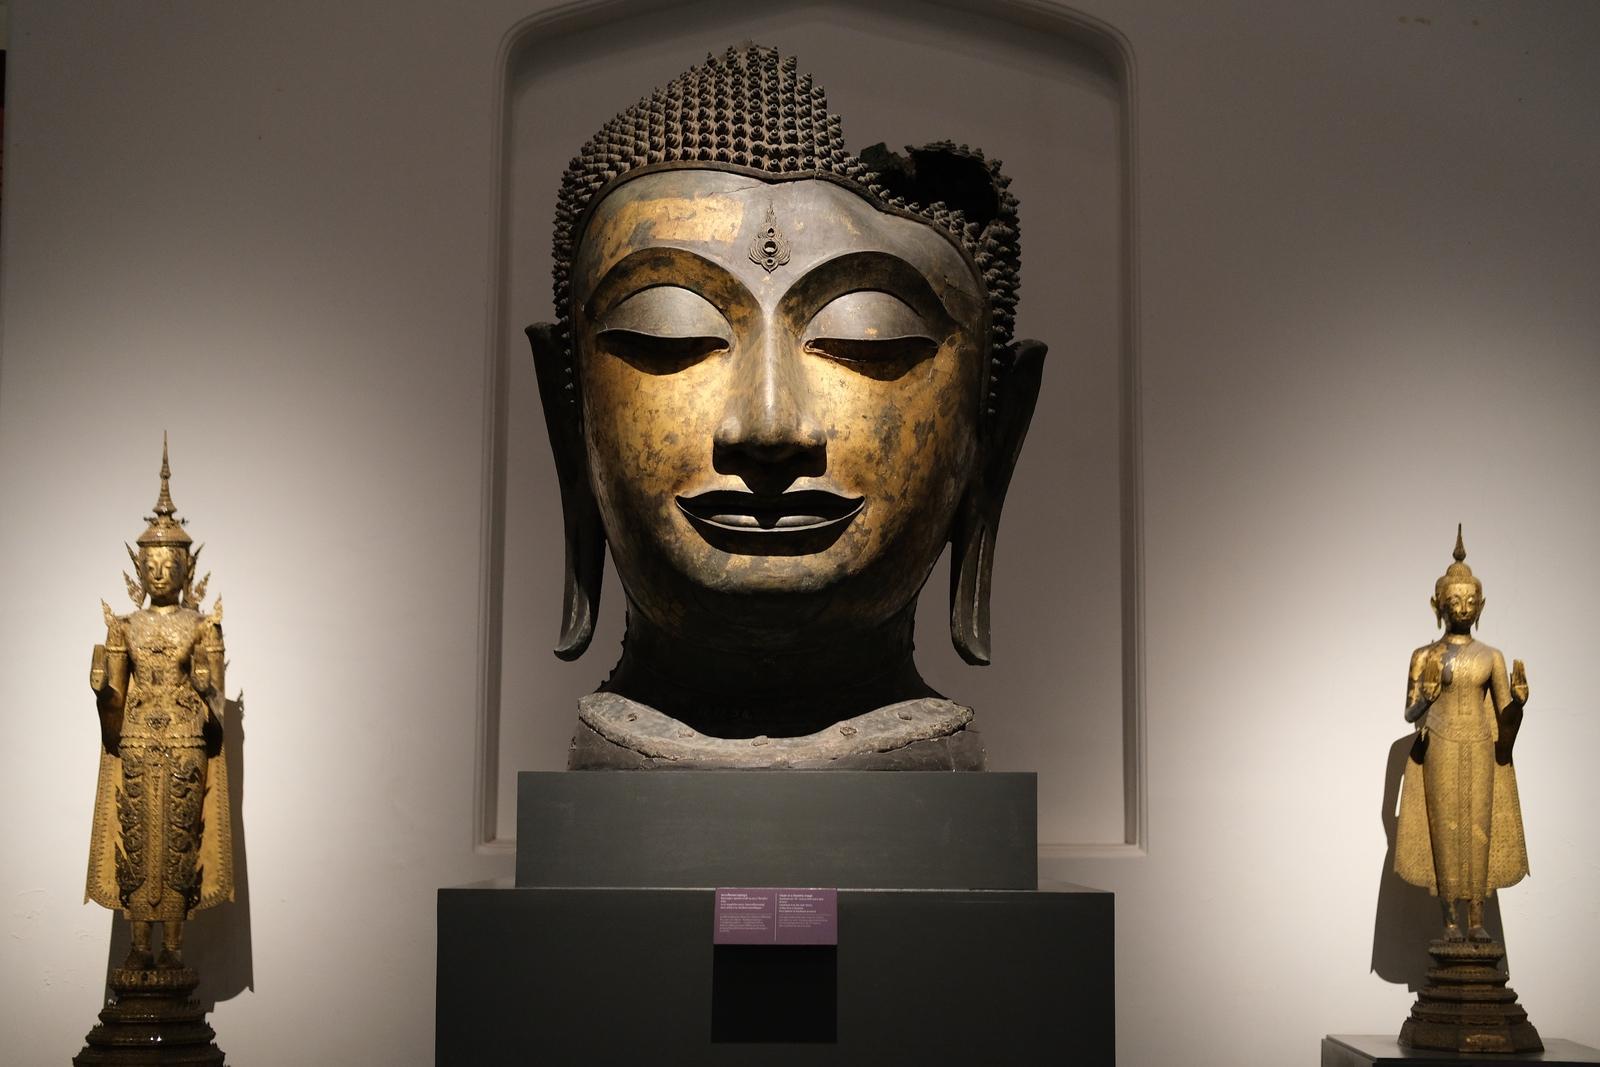 Head of Buddha Image